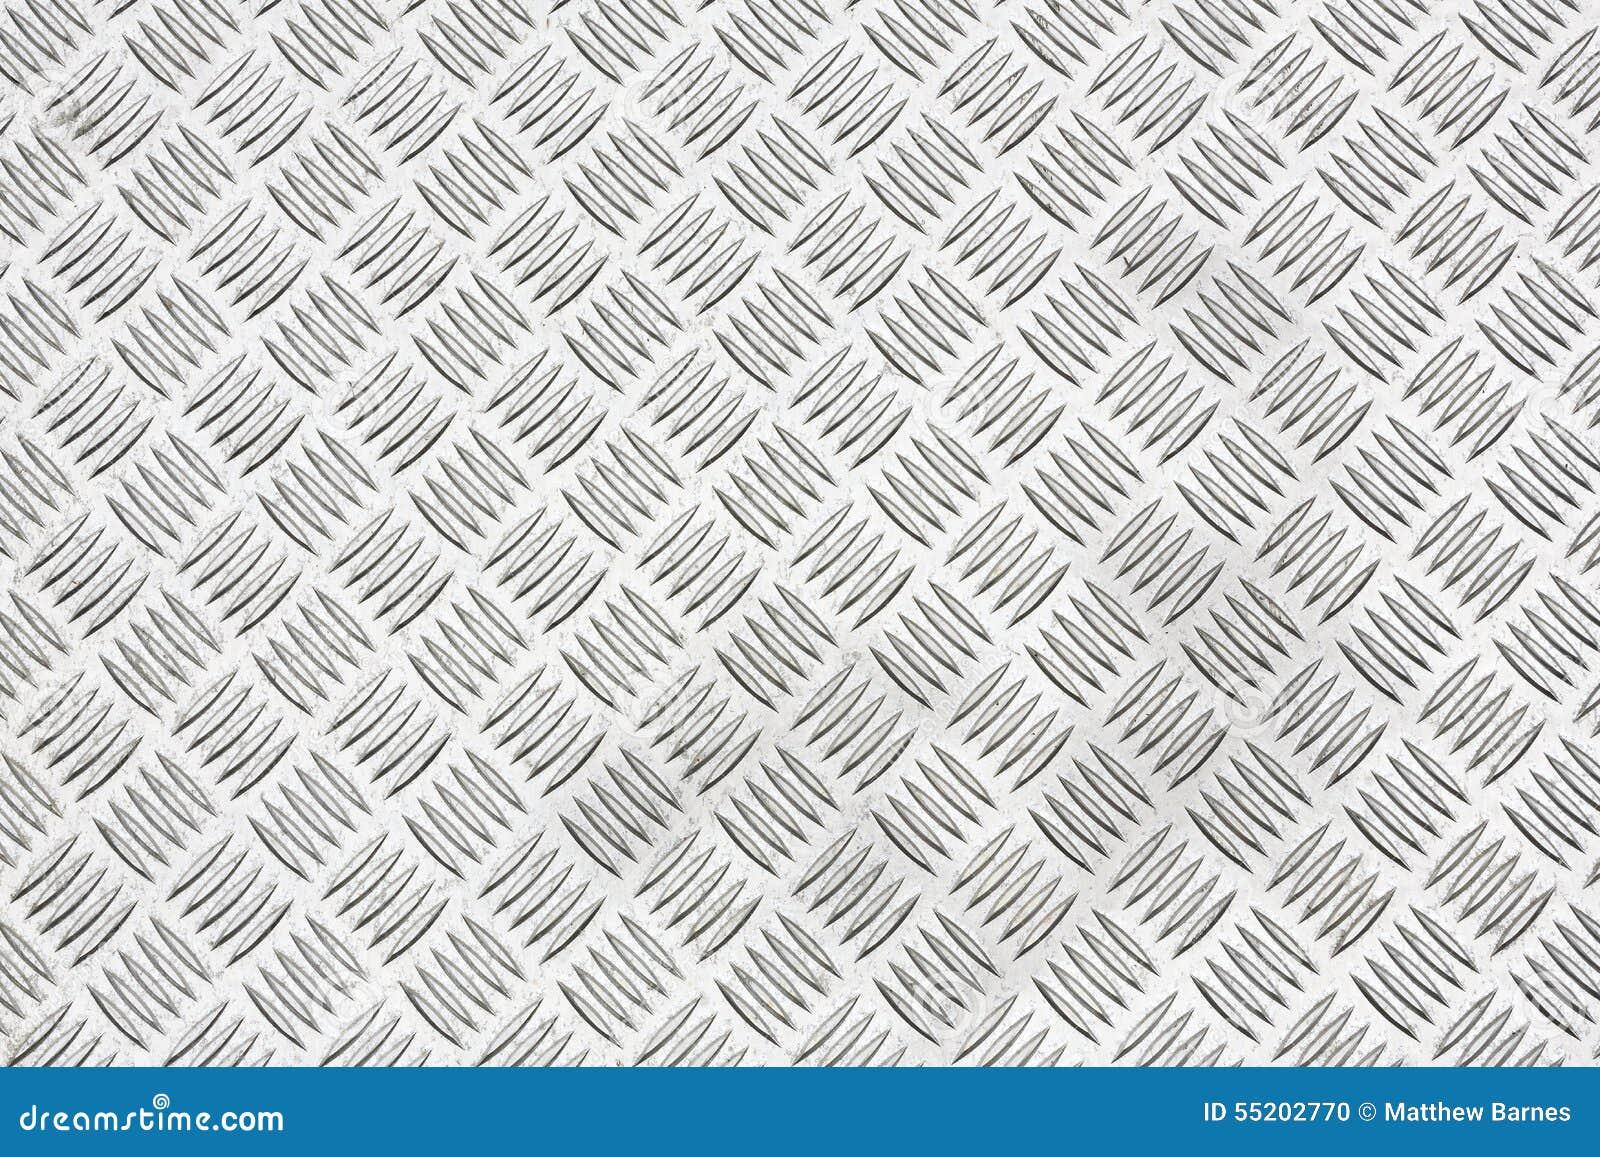 Diamond Plate Or Checker Plate Sheet Stock Photo Image